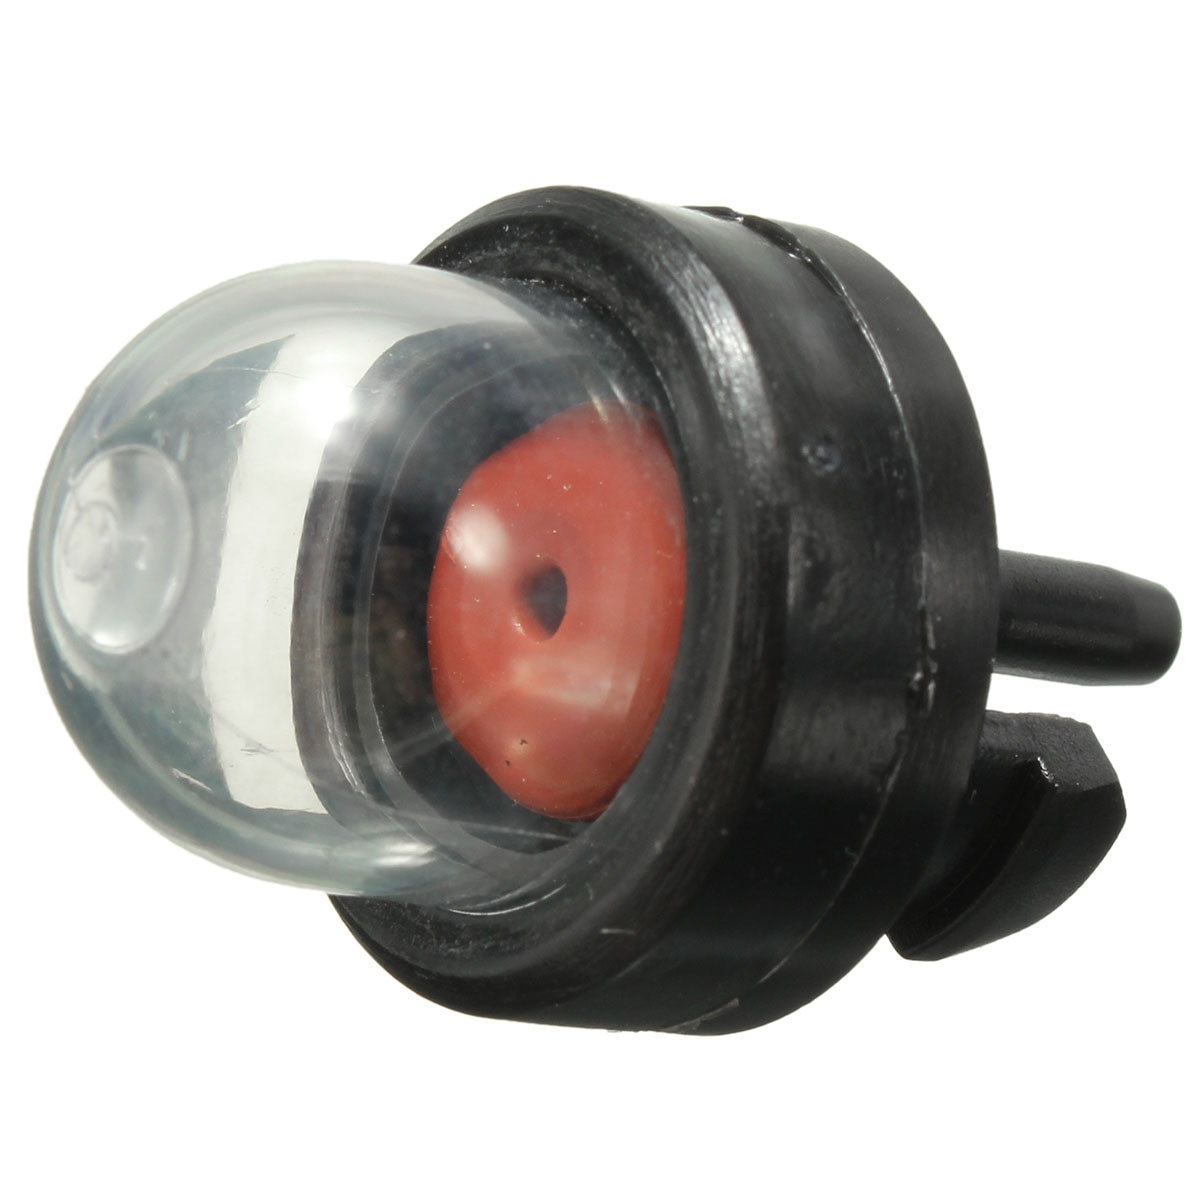 Bombilla de bomba de combustible Snap in Primer, bombillas de combustible para cortadora Stihl Ryobi WALBRO HUSQVARNA